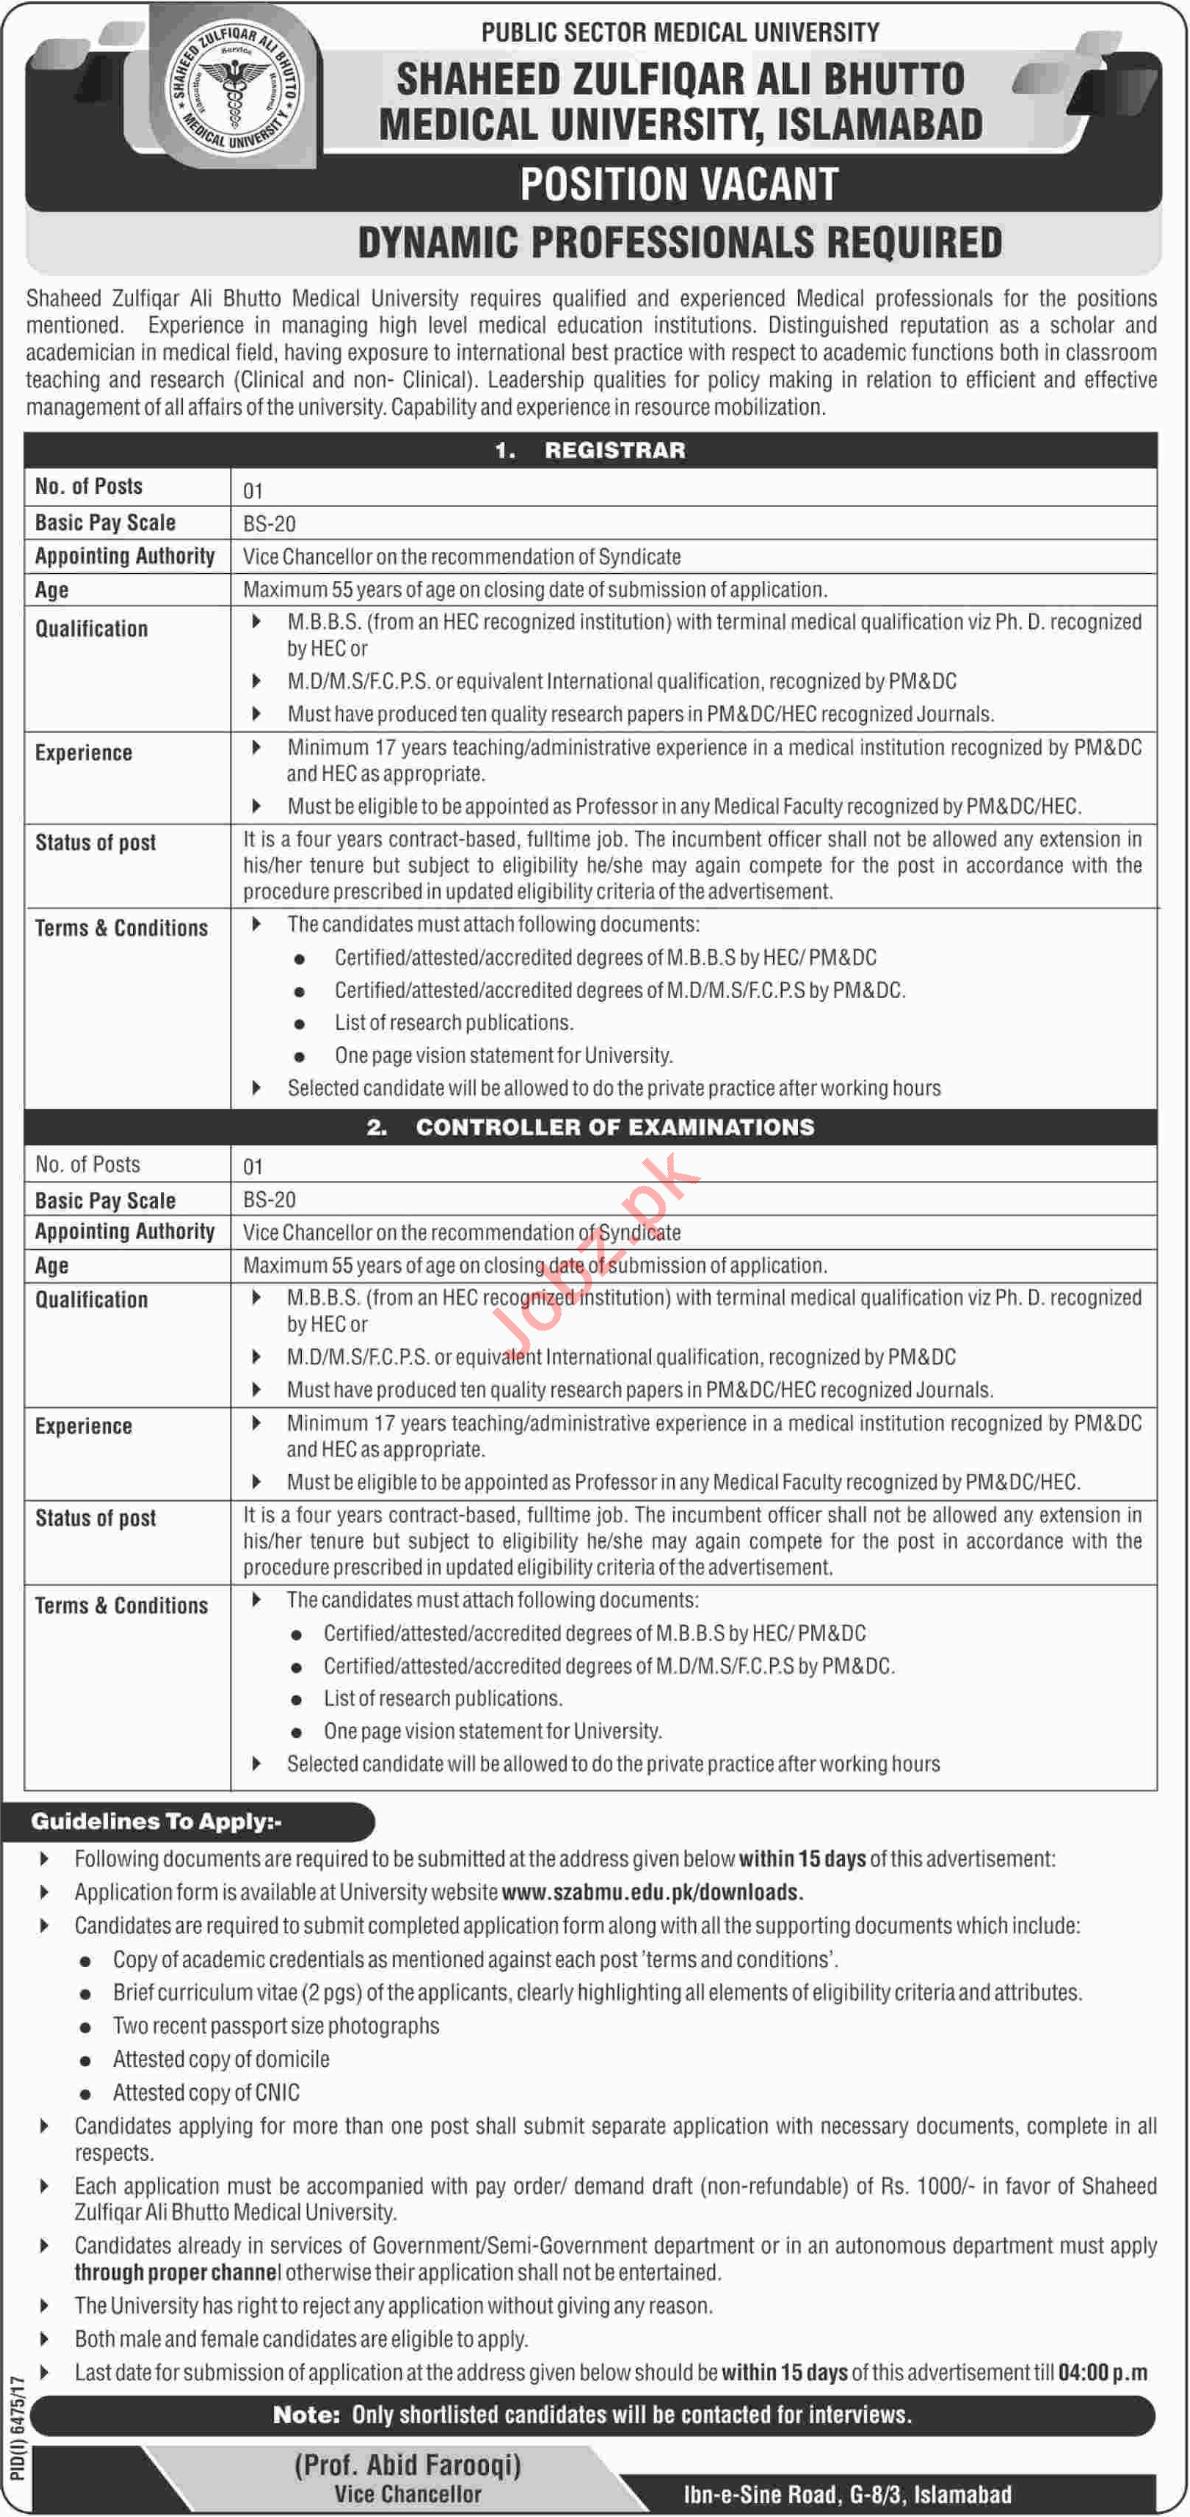 SZABMU Islamabad Jobs Registrar & Controller of Examinations